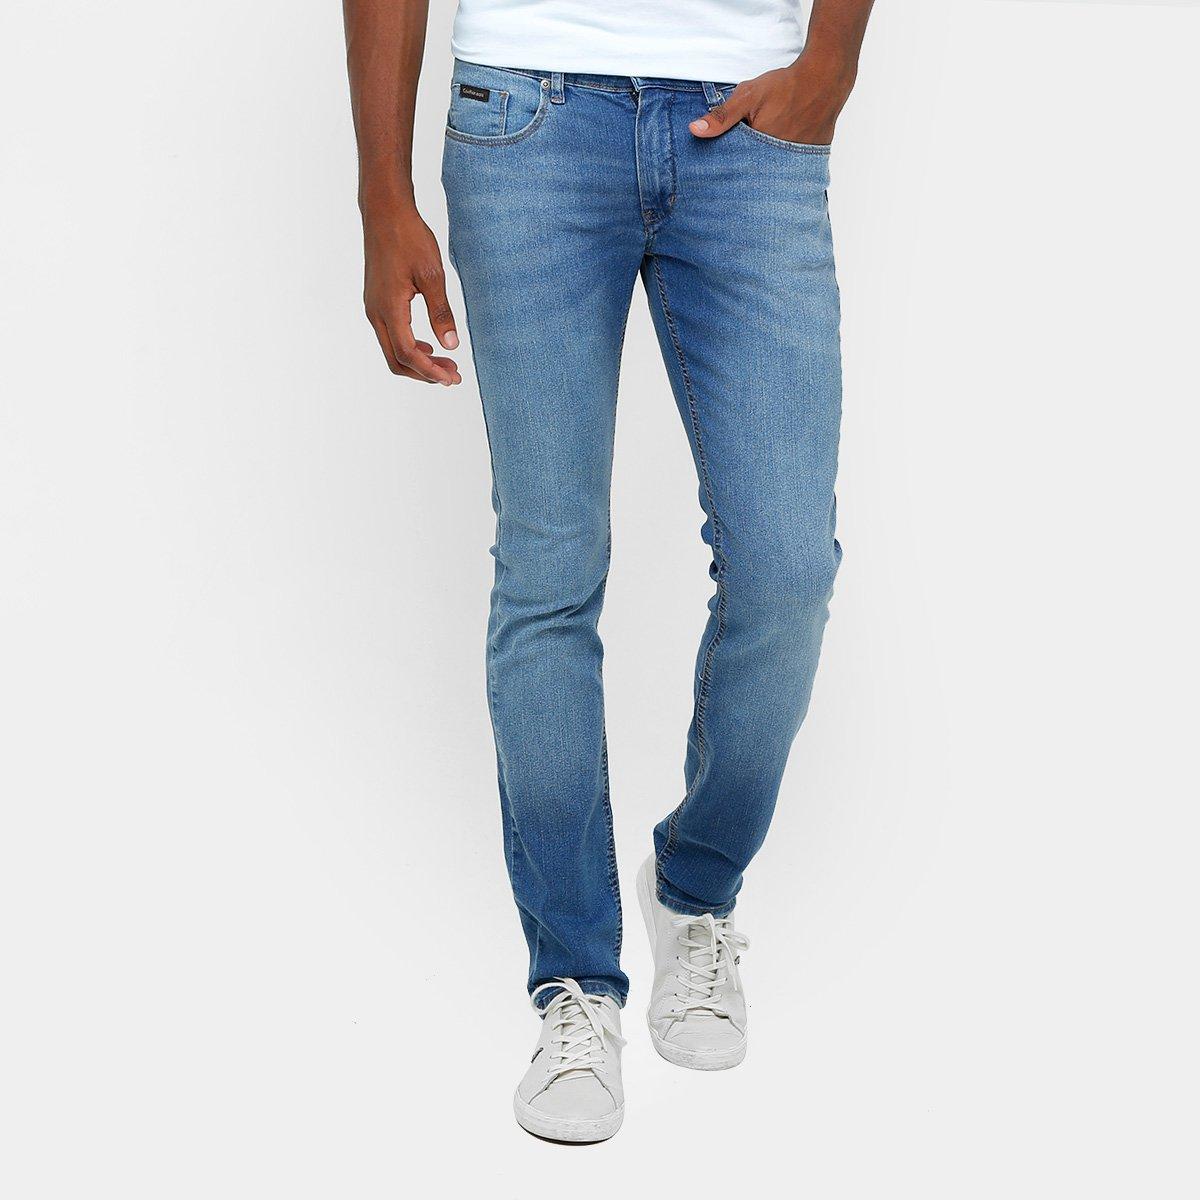 Calça Jeans Skinny Calvin Klein Estonada Elastano Masculina - Compre ... 12fc73d500